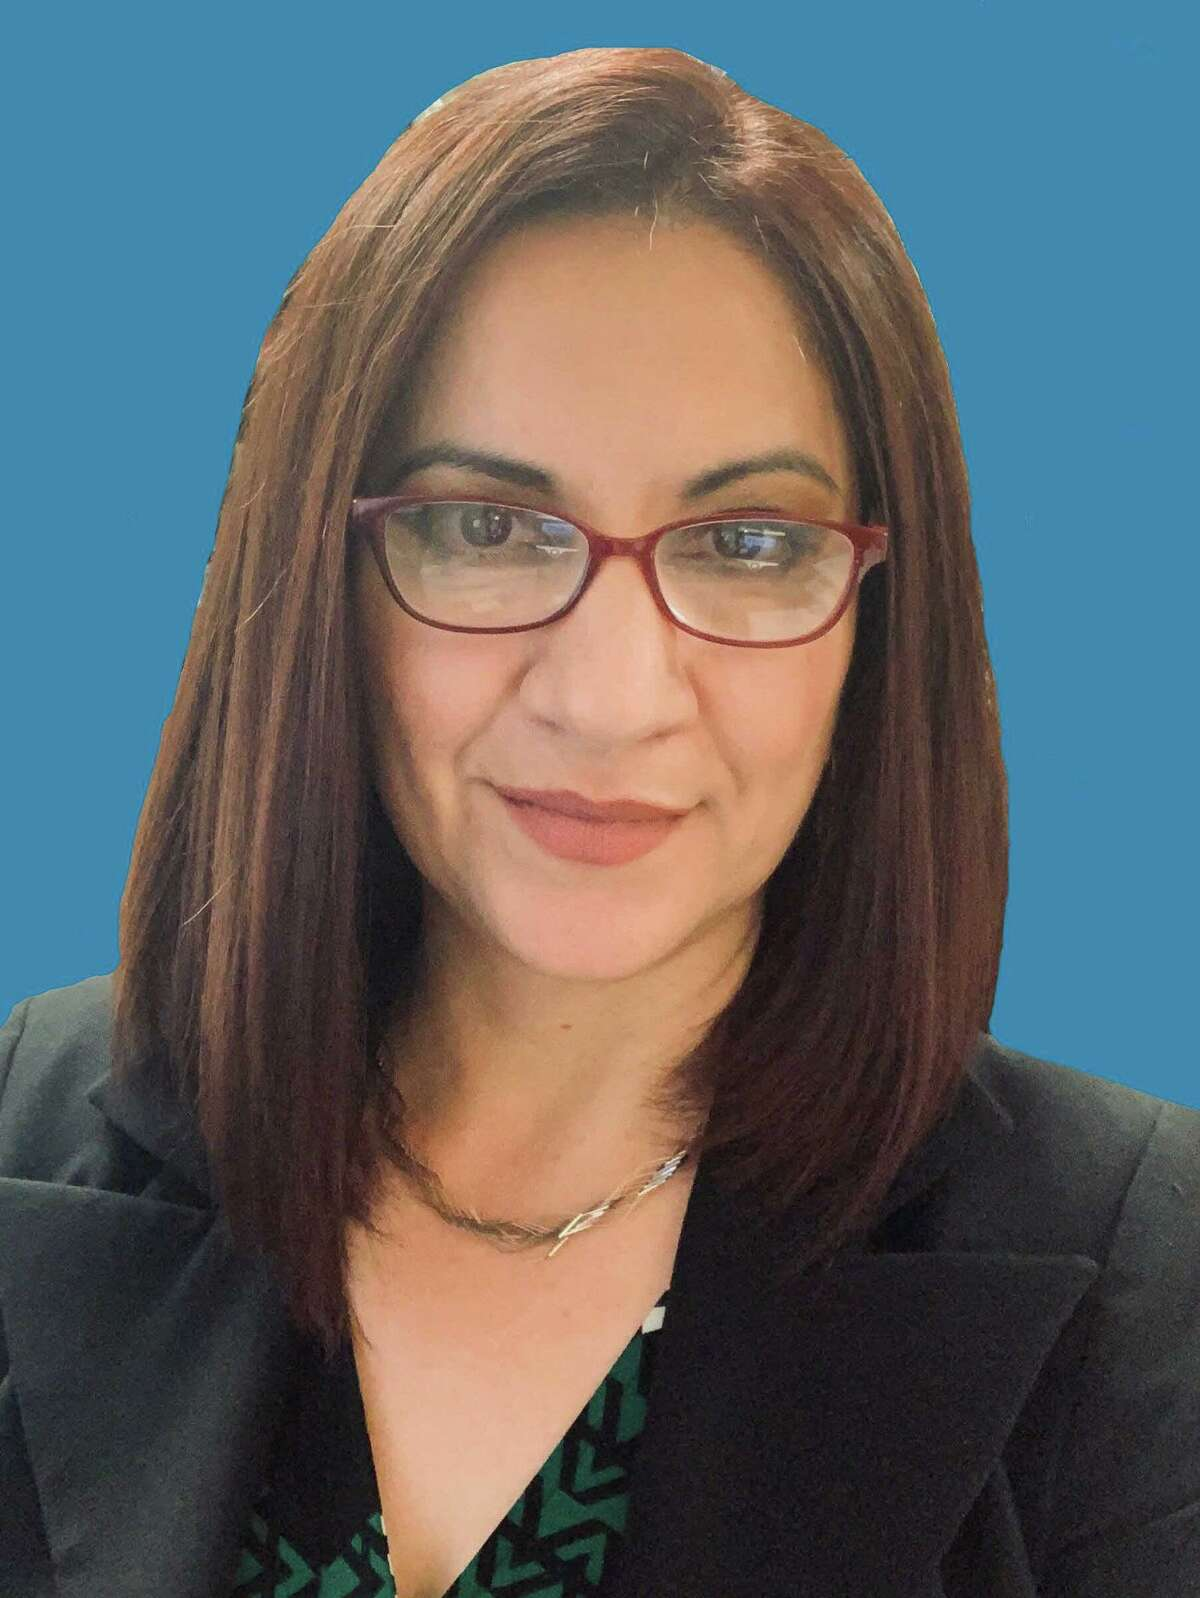 Araceli Garza